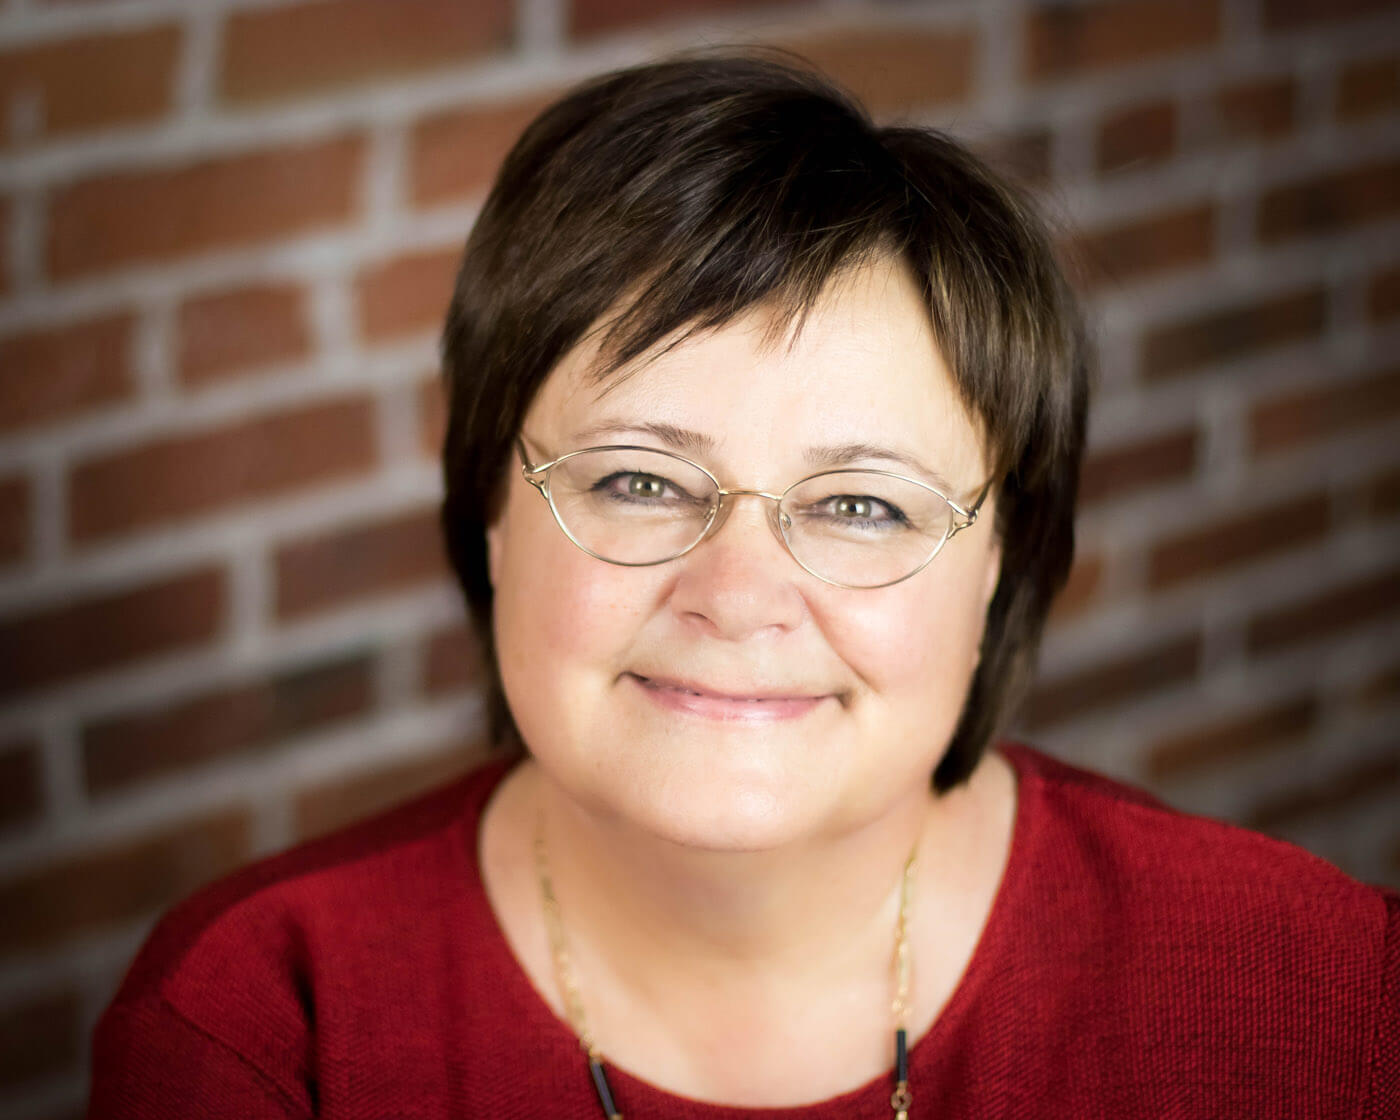 Jill Fredrickson